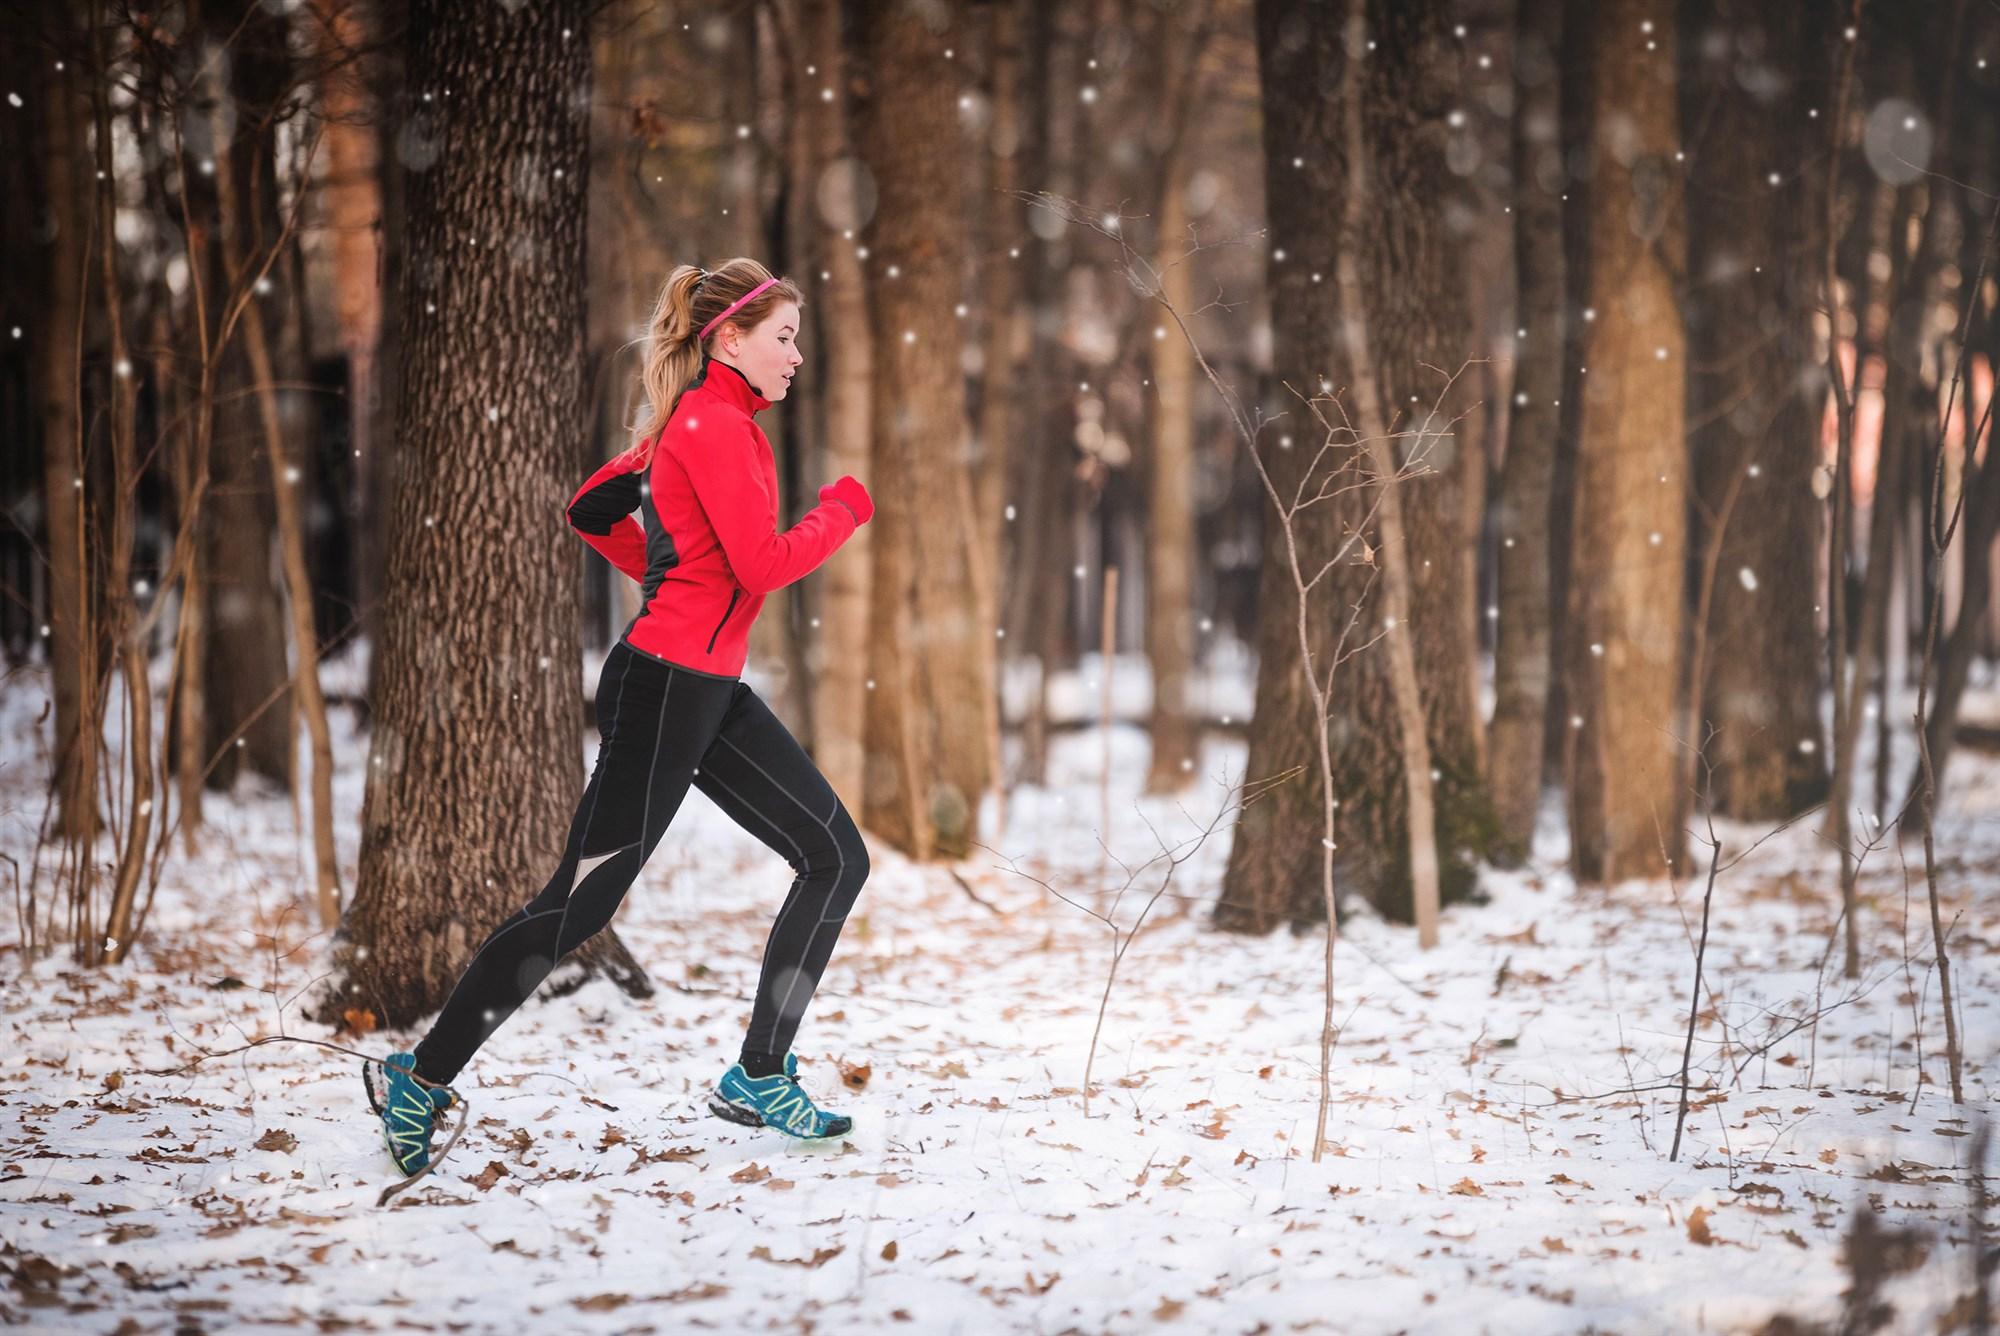 180112-jogger-snow-cold-weather-ac-451p_8595d7bb5dfc1251c181e3c37ff4f44b.fit-2000w.jpg